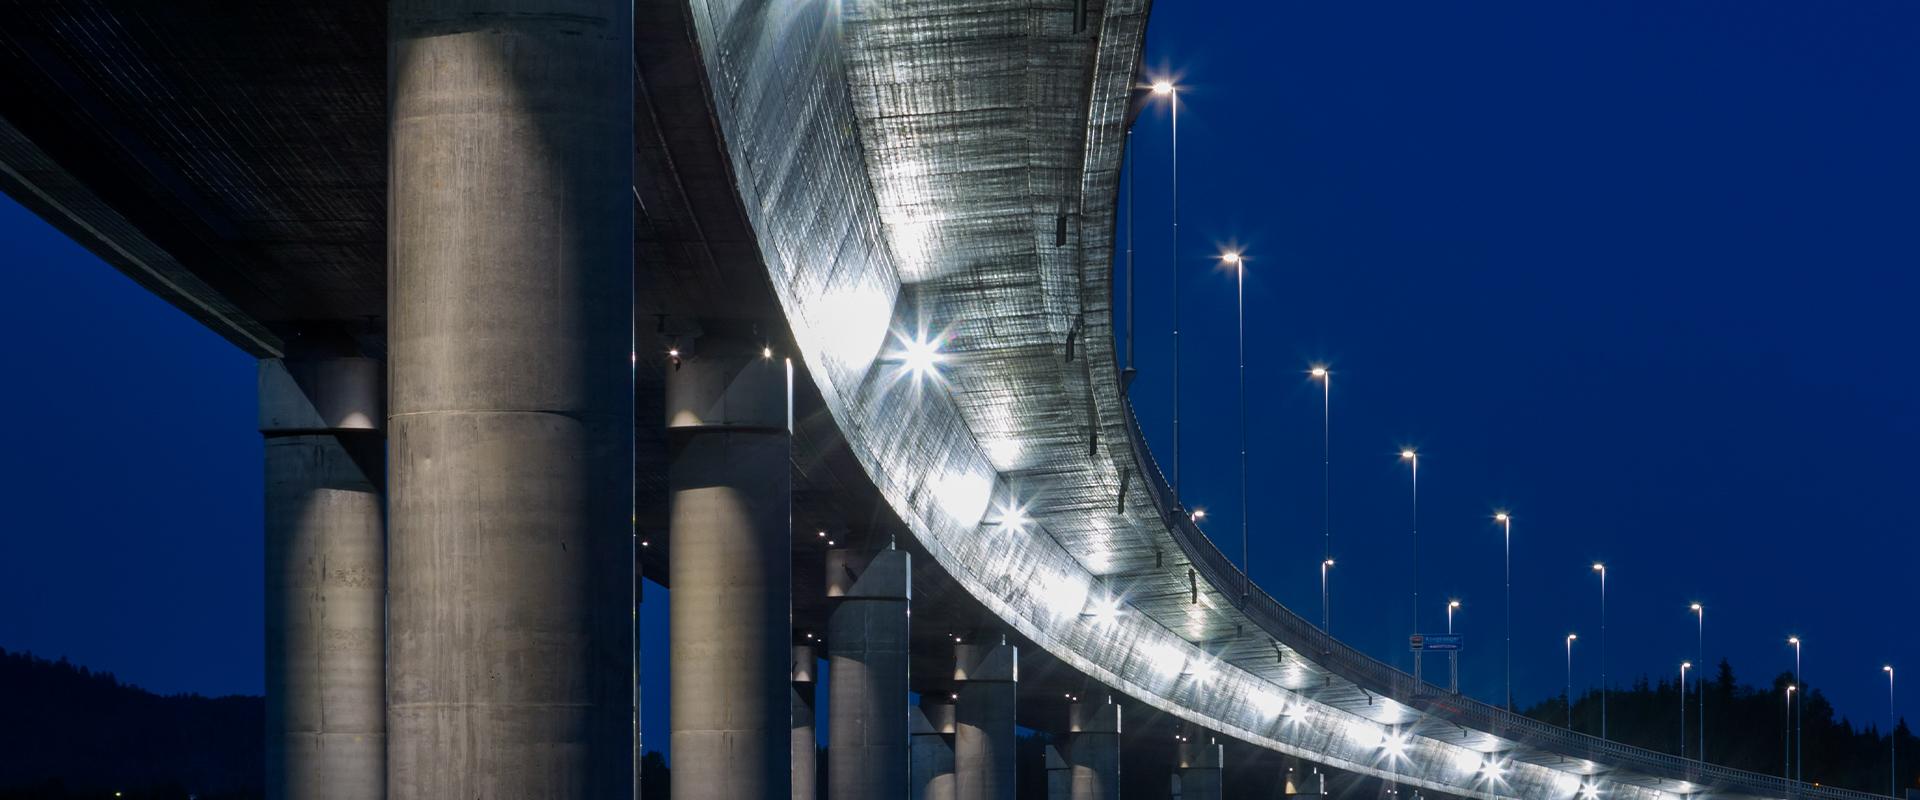 Armatura stradale LED